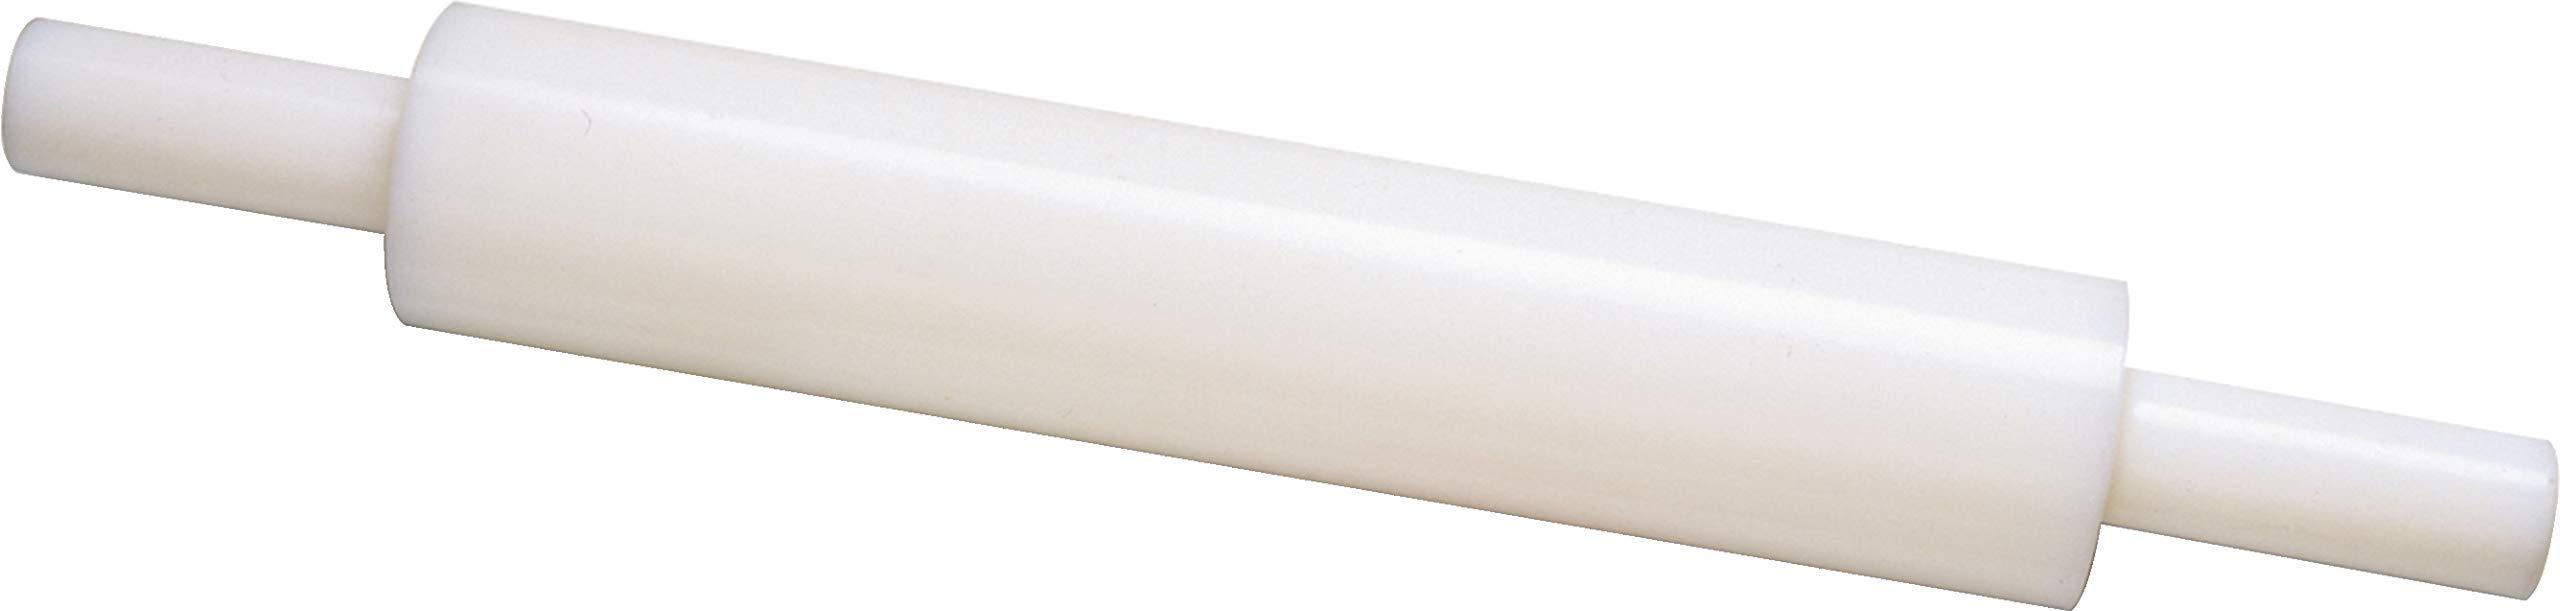 San Jamar RP15 Poly-Roll Polyethylene Rolling Pin, 15'' Length